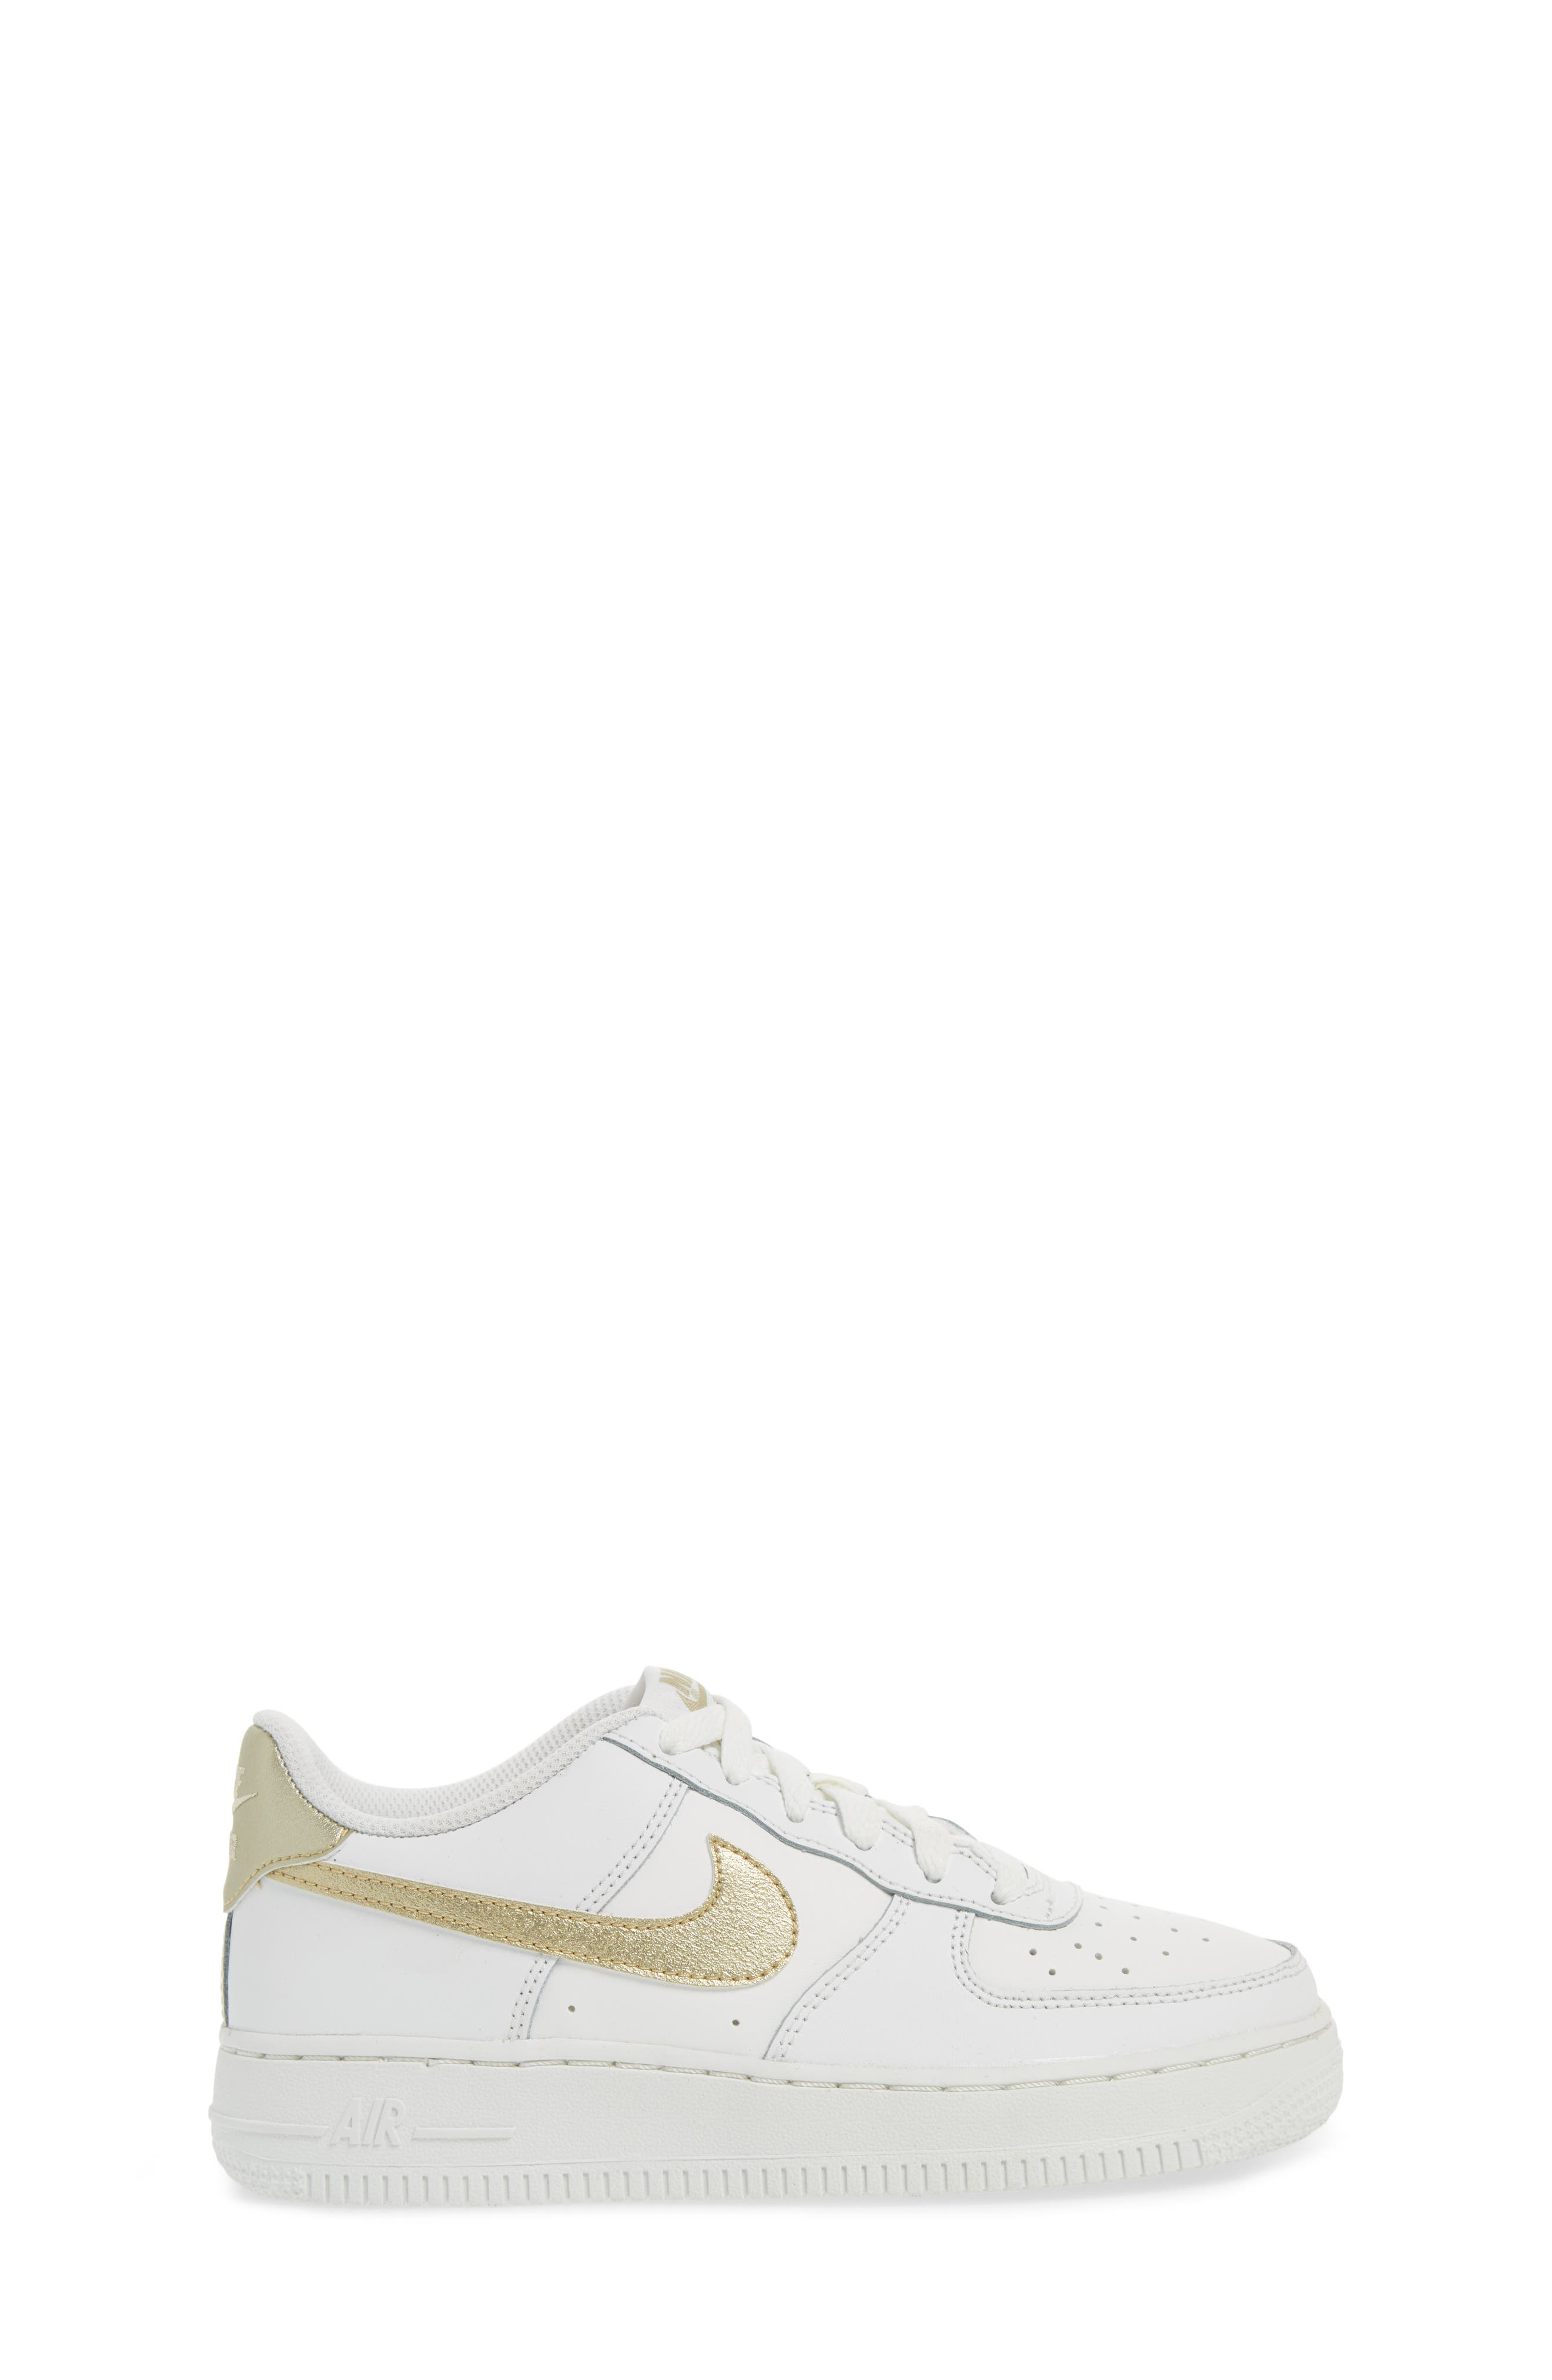 Air Force 1 '06 Sneaker,                             Alternate thumbnail 7, color,